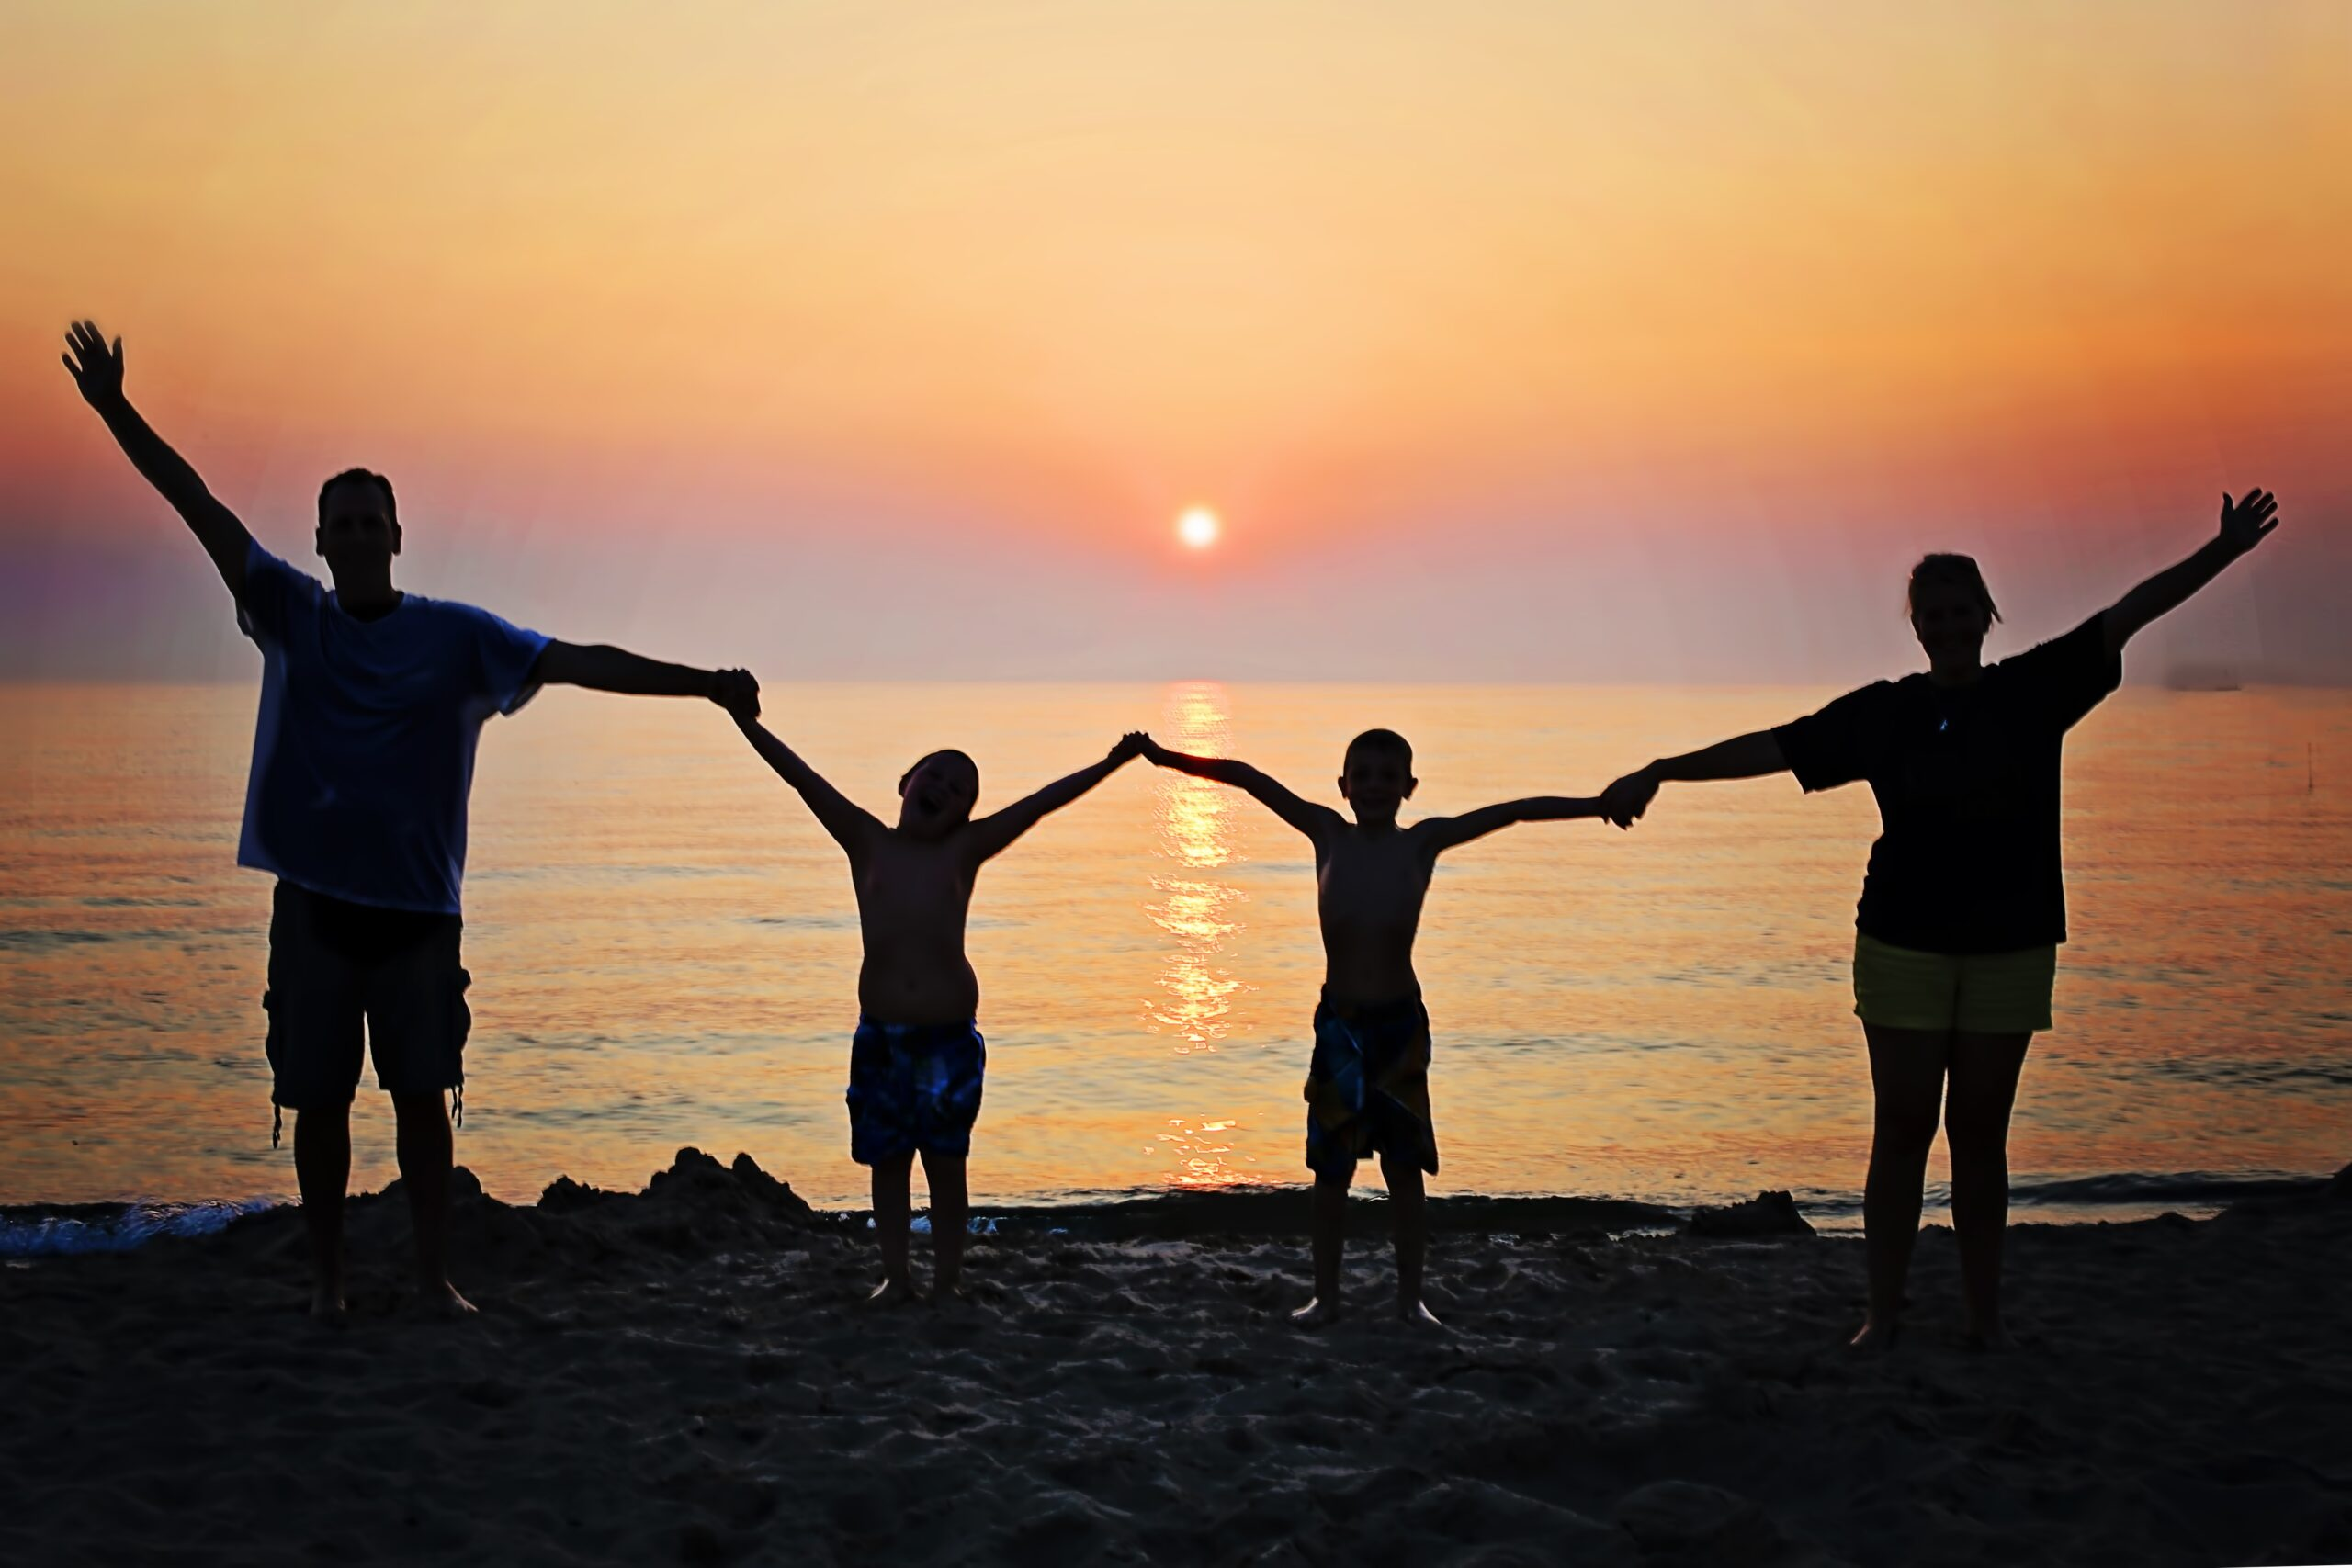 https://i2.wp.com/amortgageforyou.com/wp-content/uploads/New-Home-Family-on-the-Beach-scaled.jpg